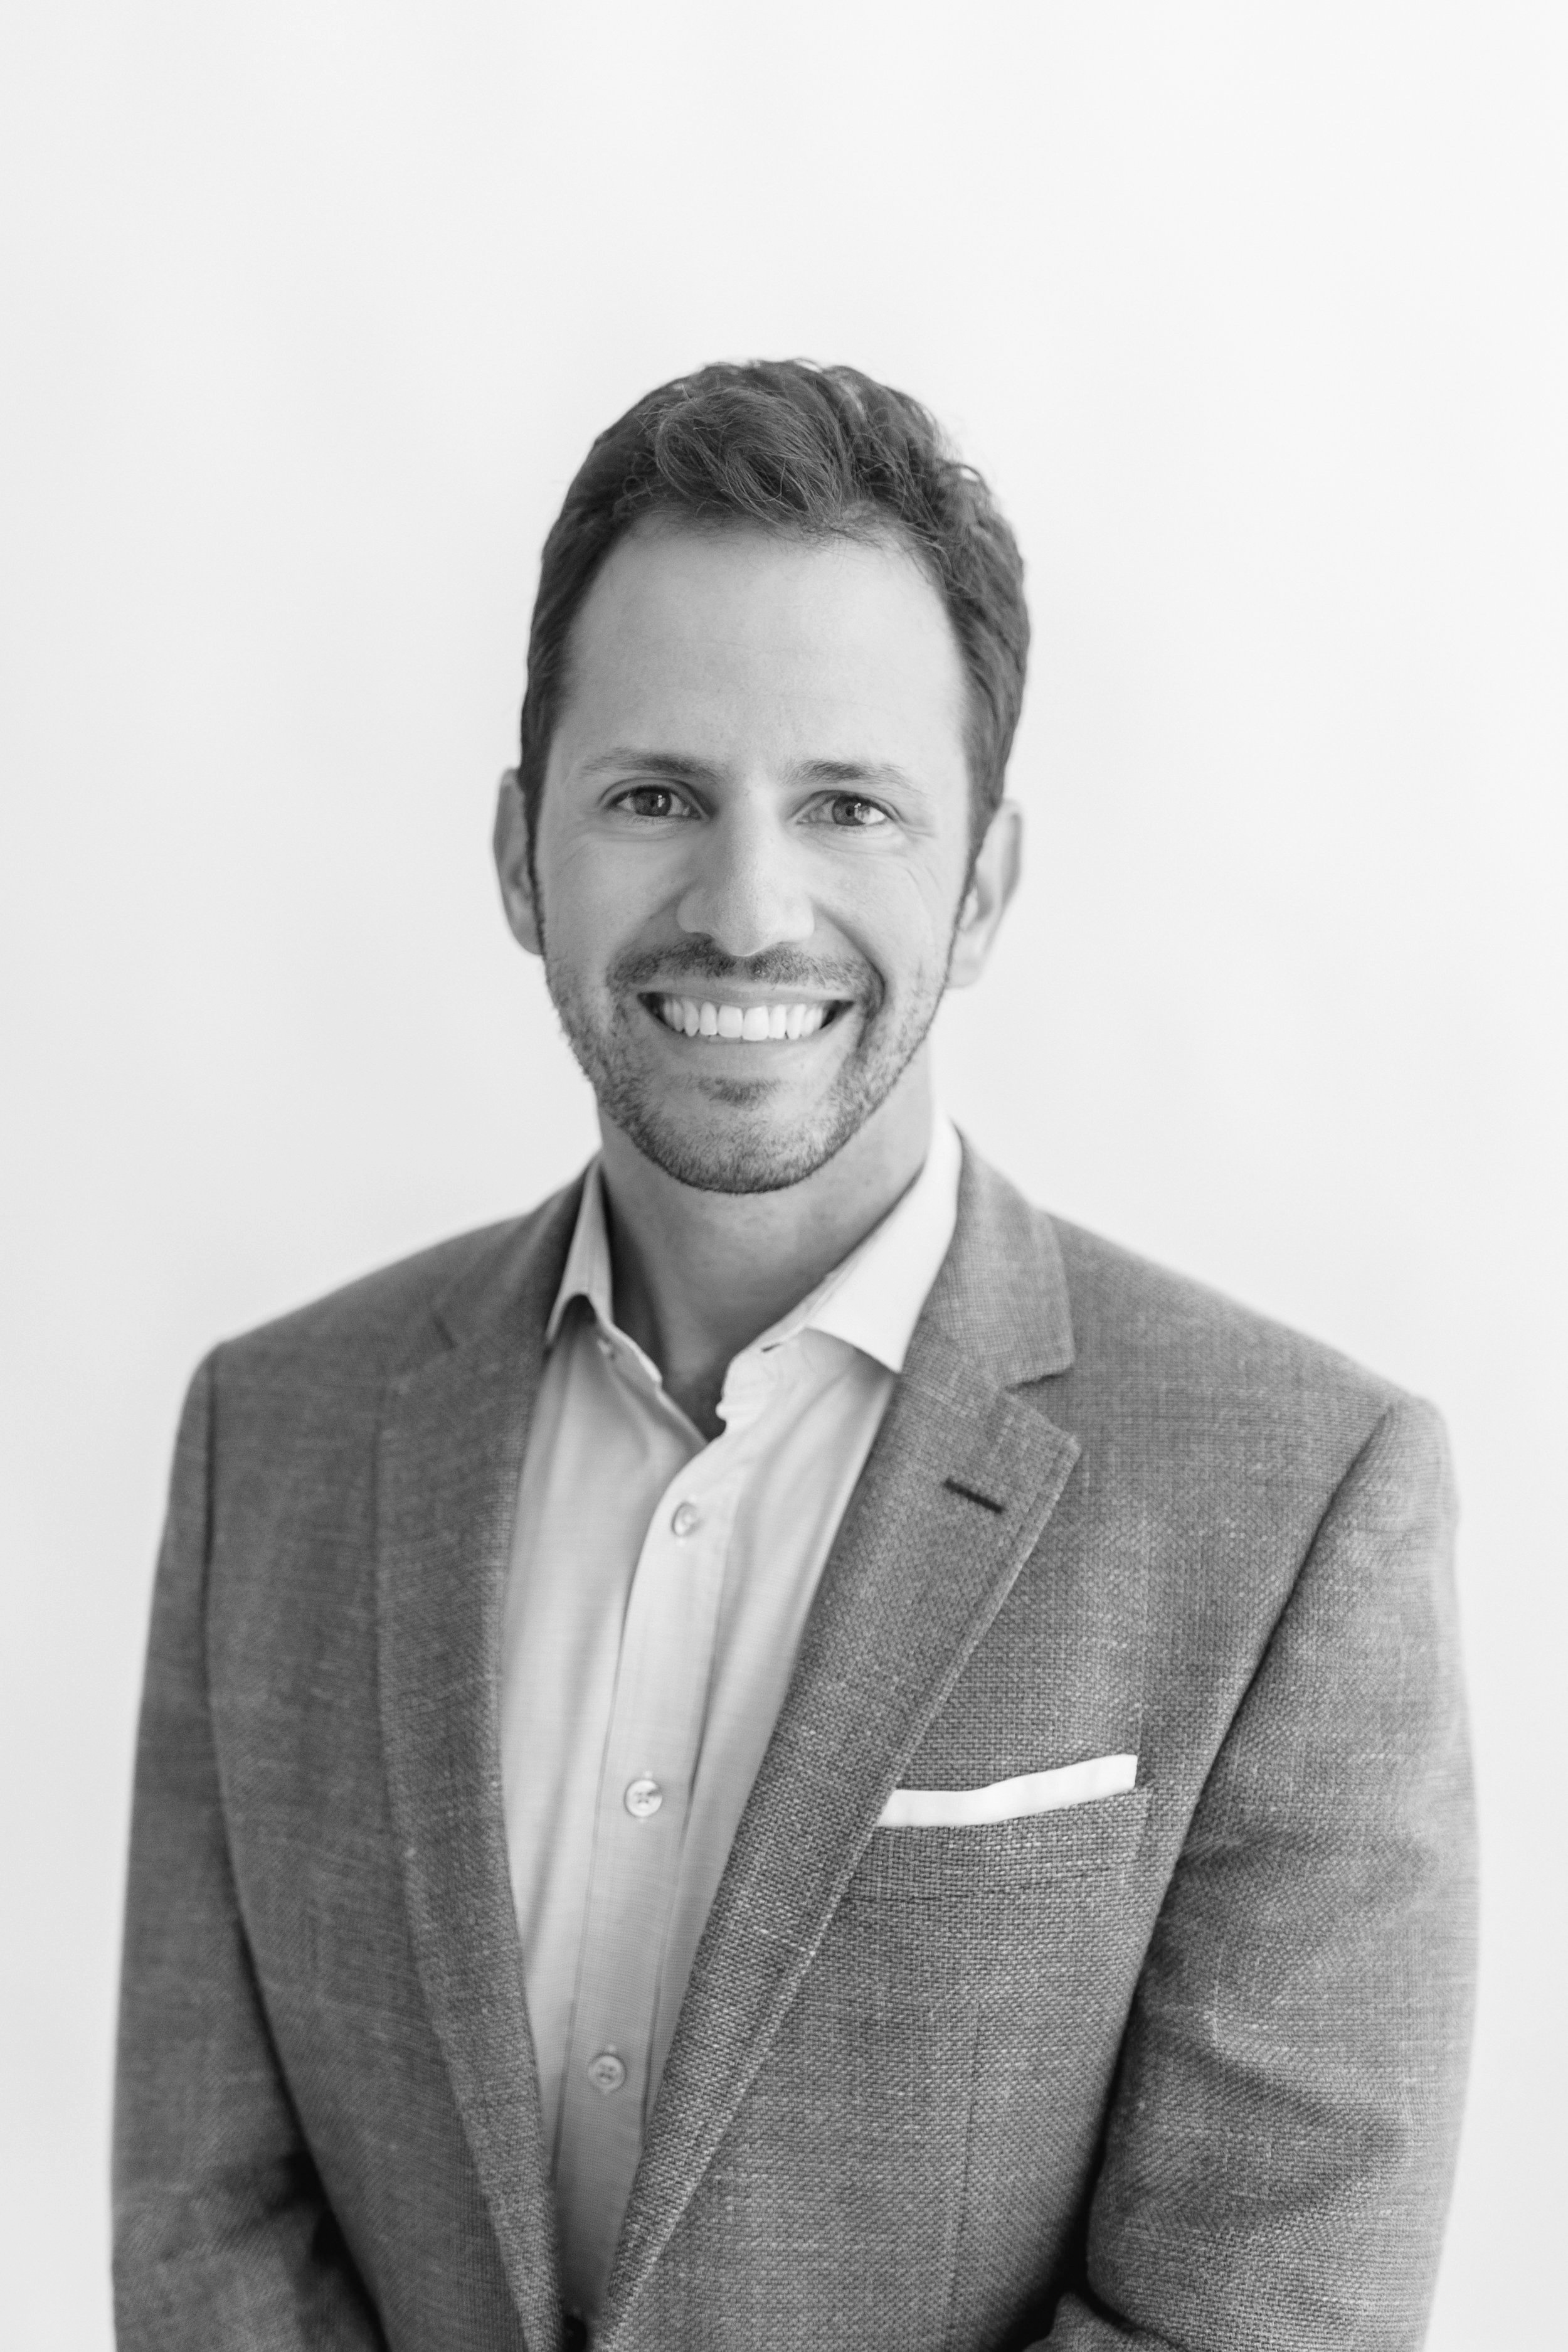 BRIAN DETRI | Managing Director - Construction